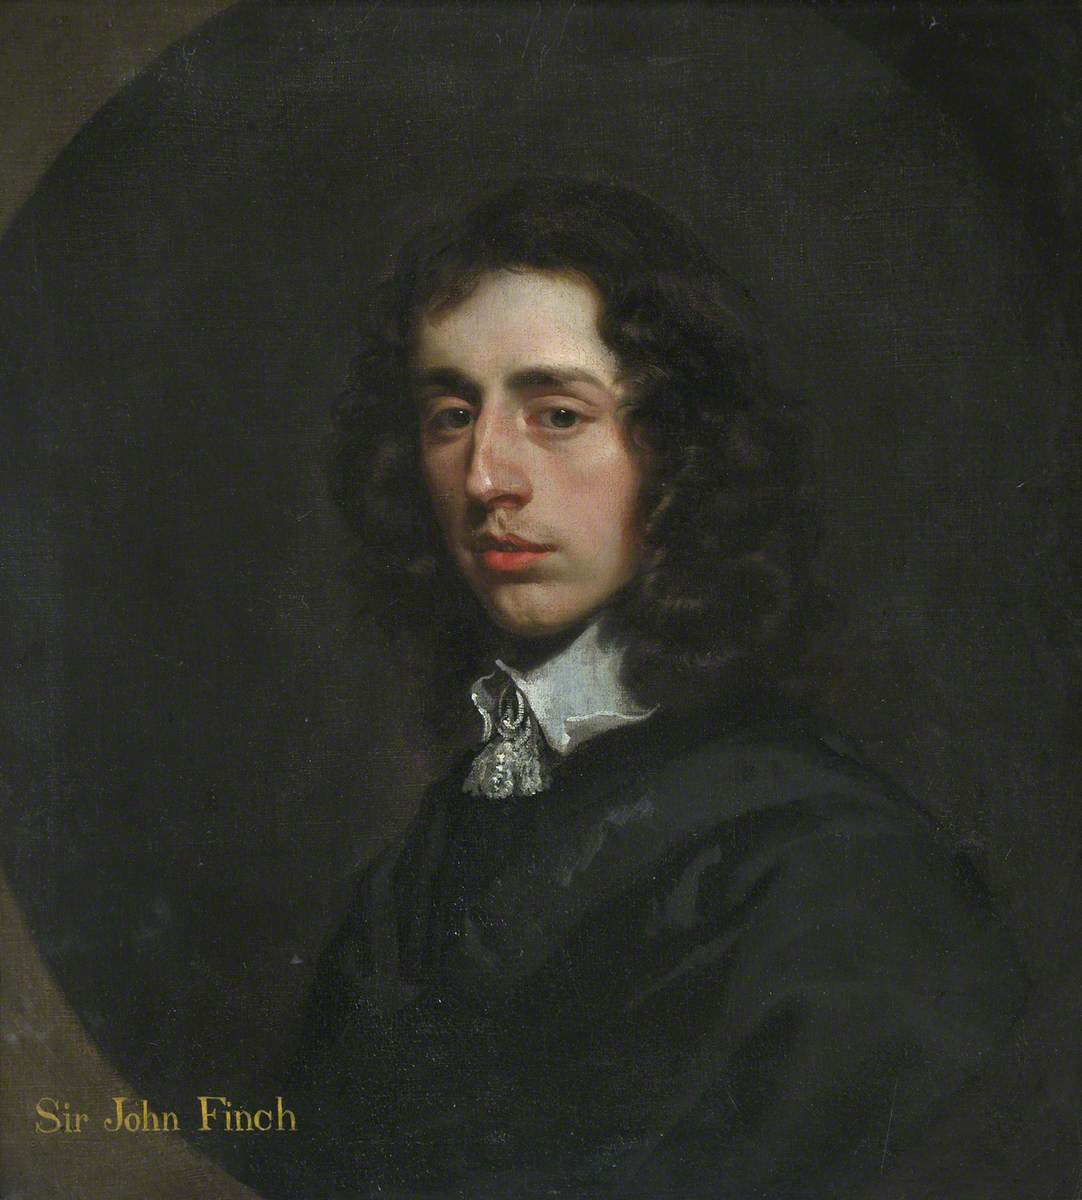 Sir John Finch (1626–1682), Ambassador at Constantinople, Professor at Pisa University